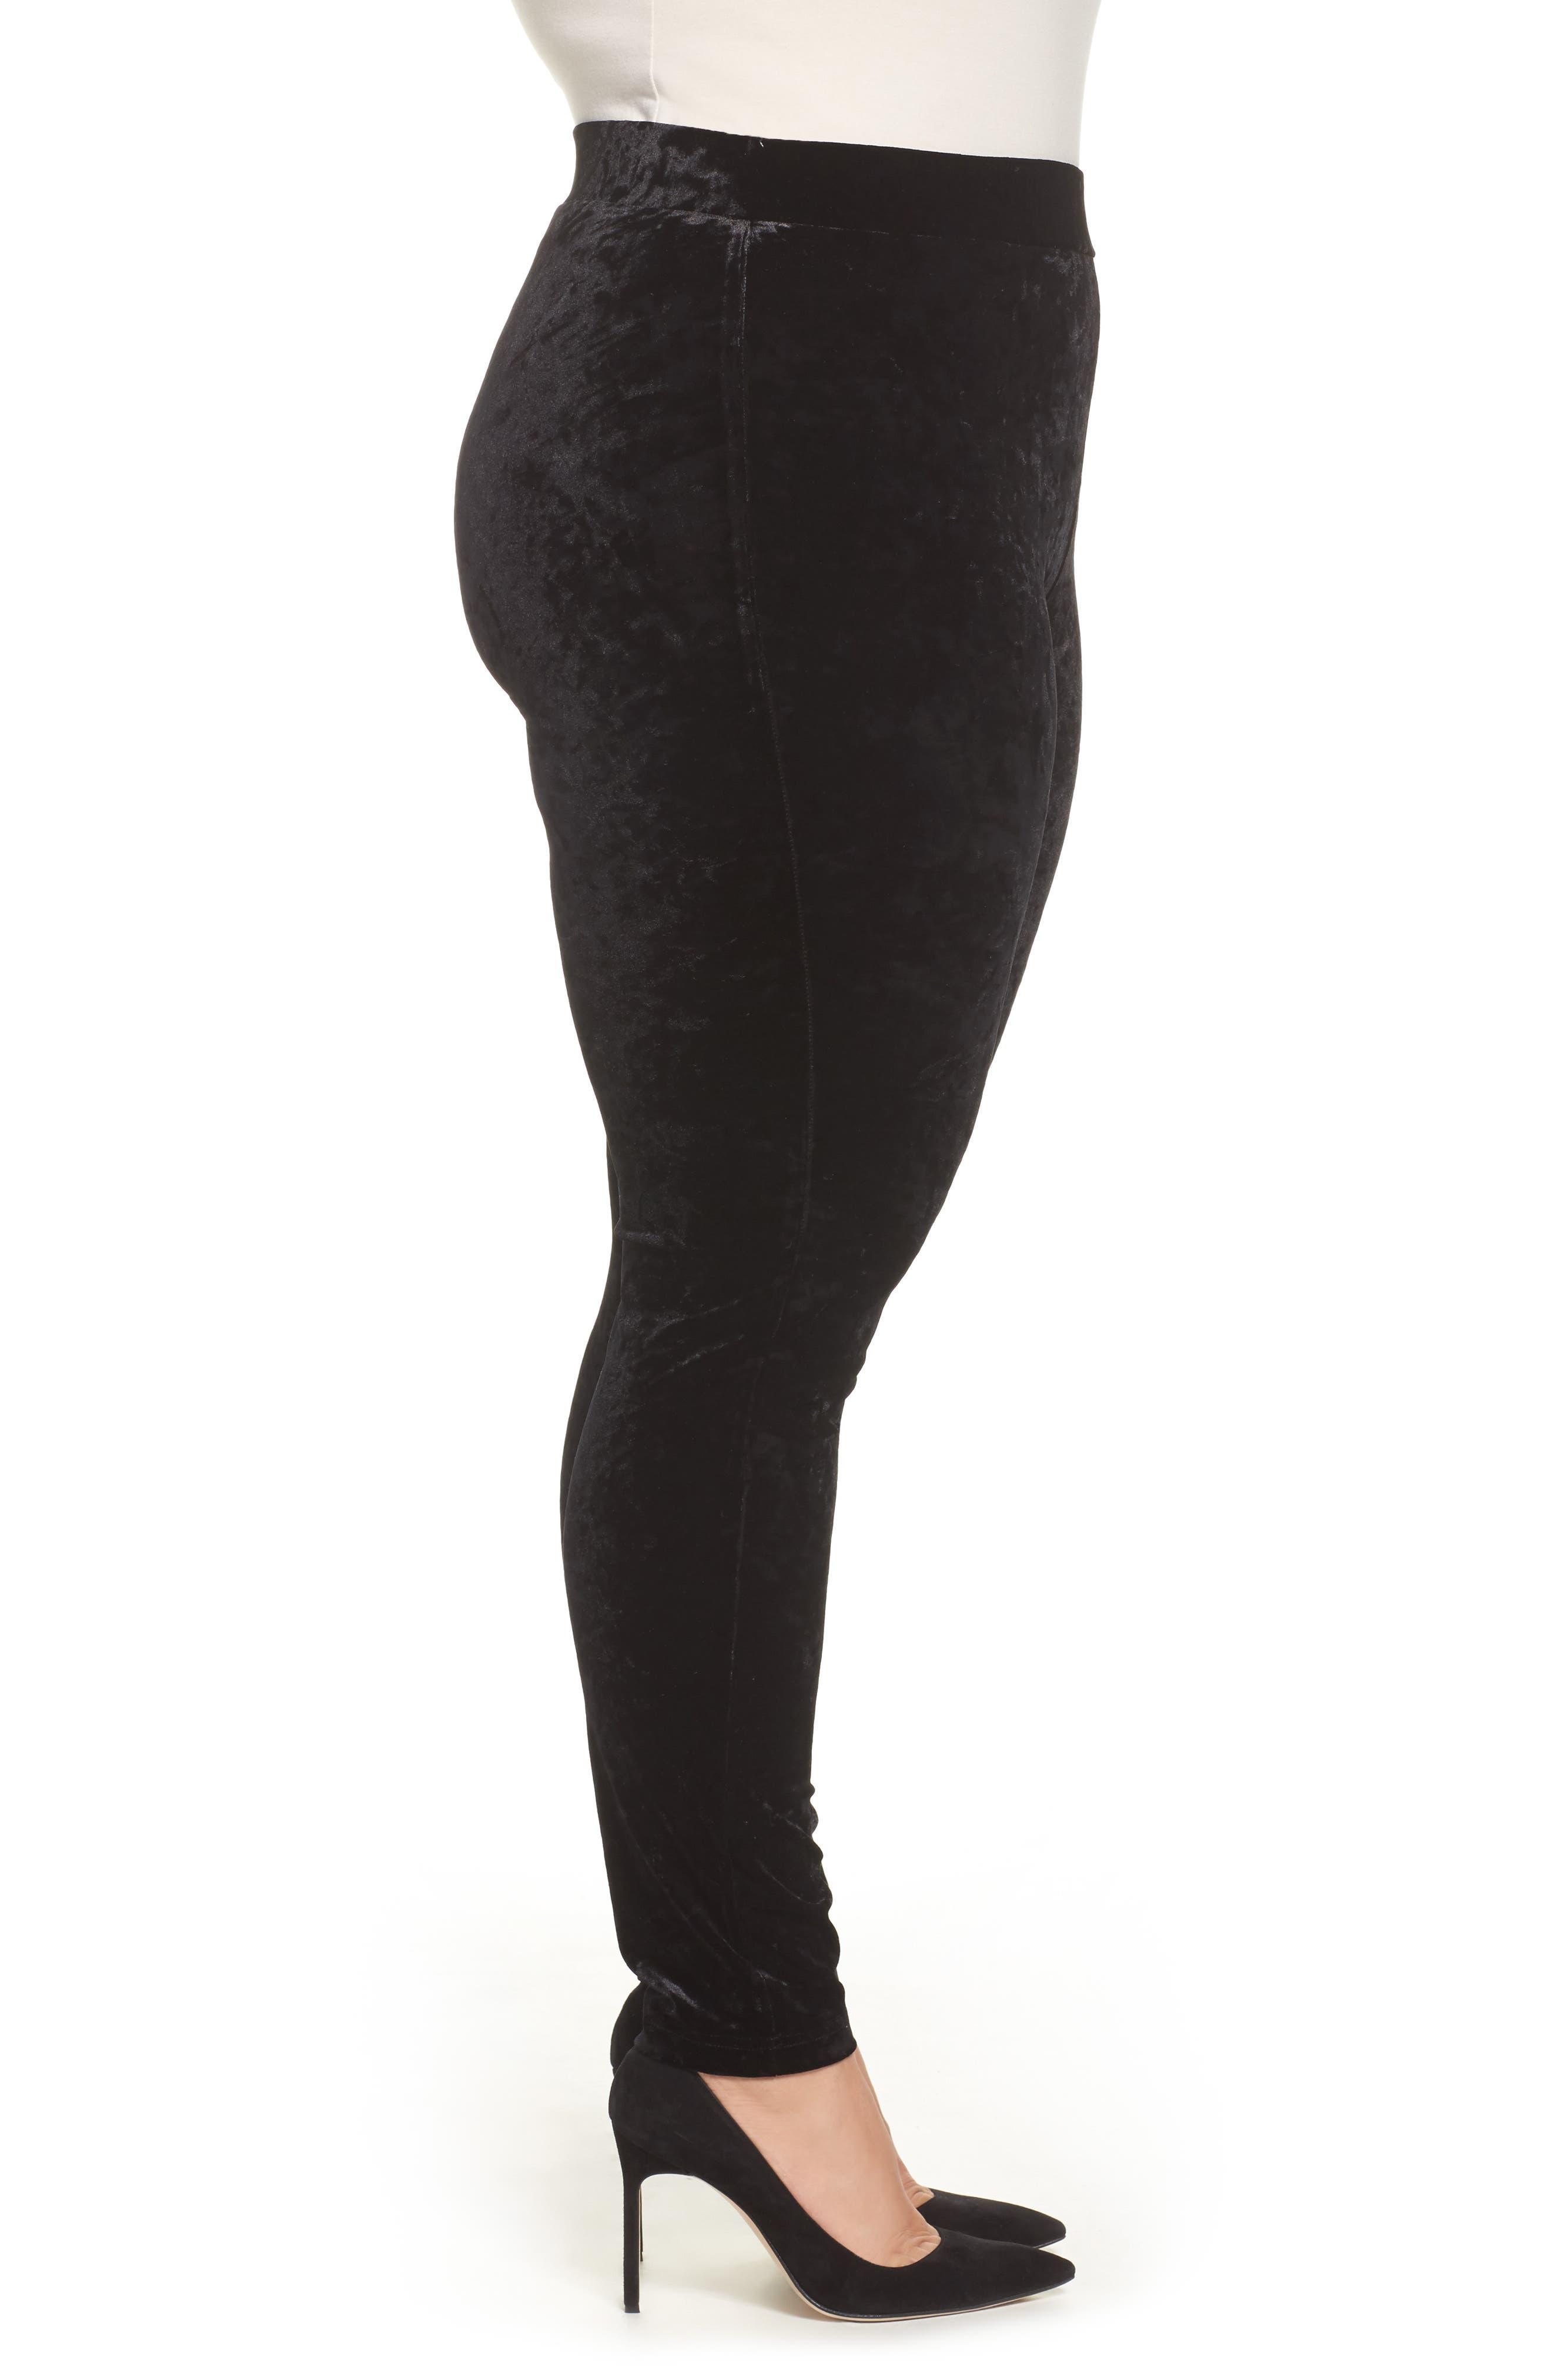 Alternate Image 3  - Vince Camuto Crushed Velvet Knit Leggings (Plus Size)